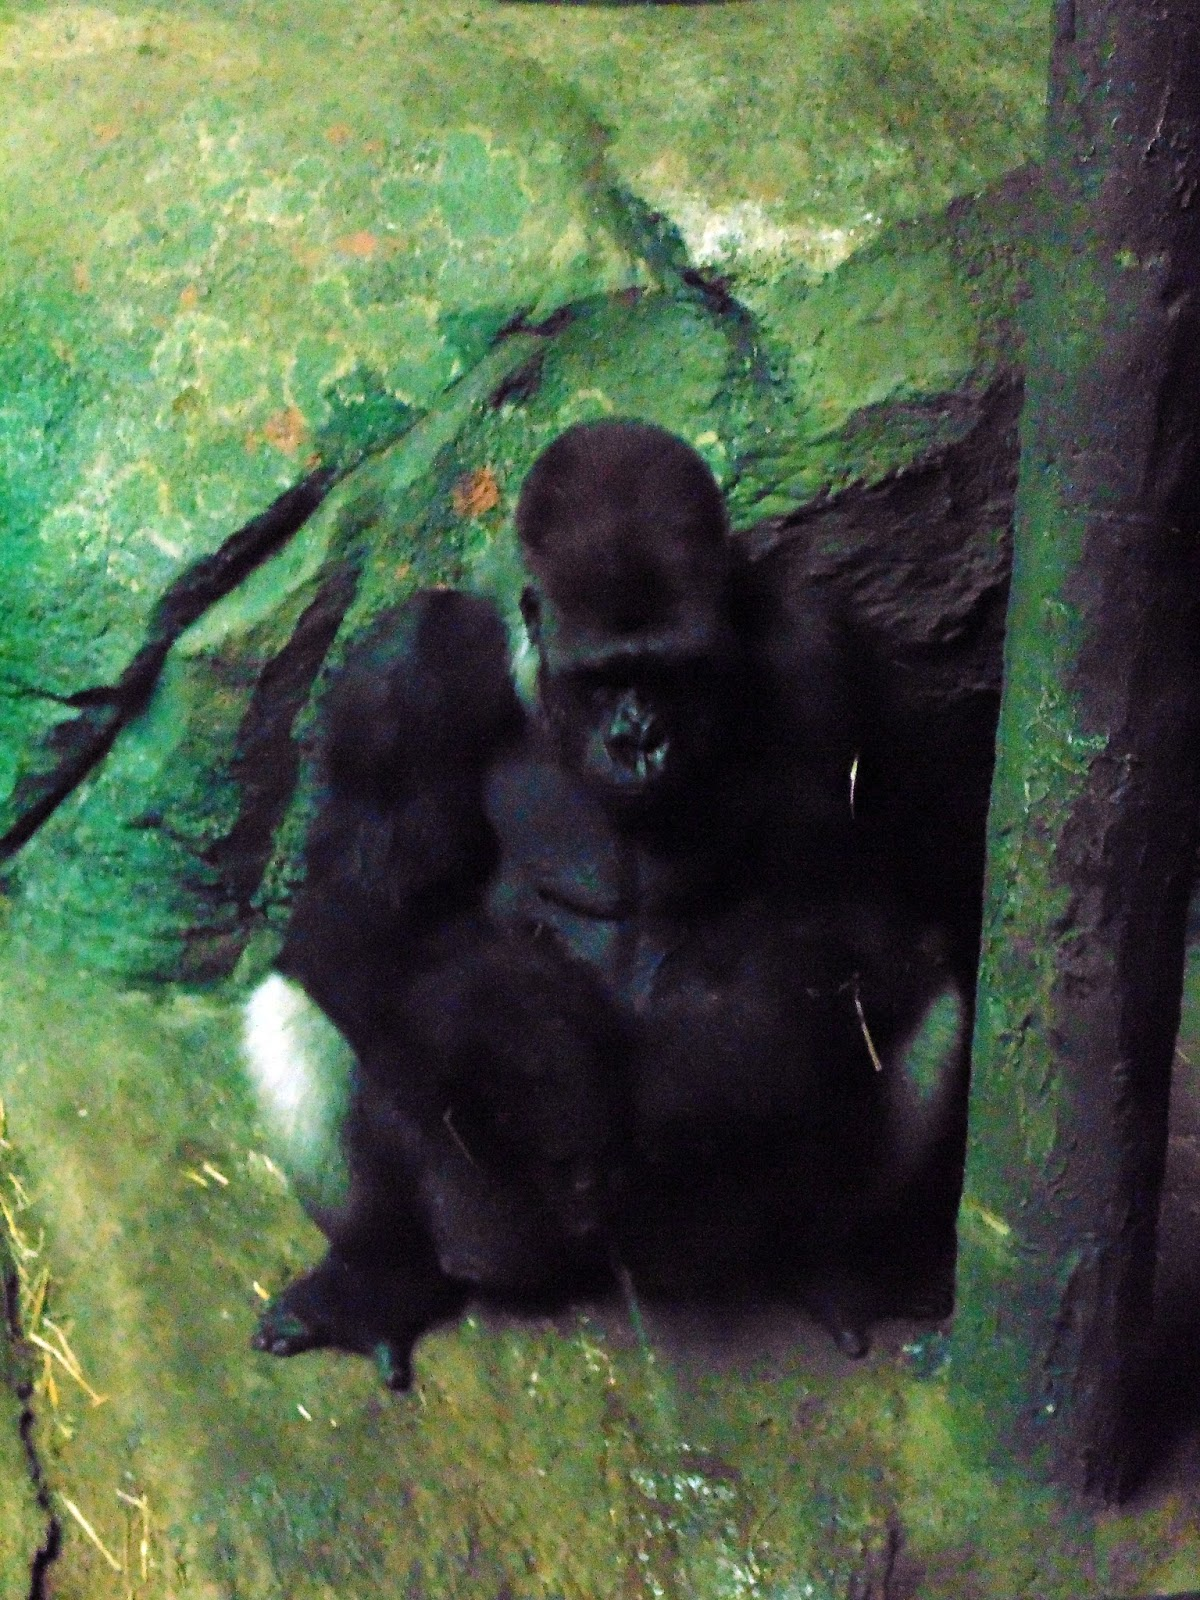 gorilla peeing